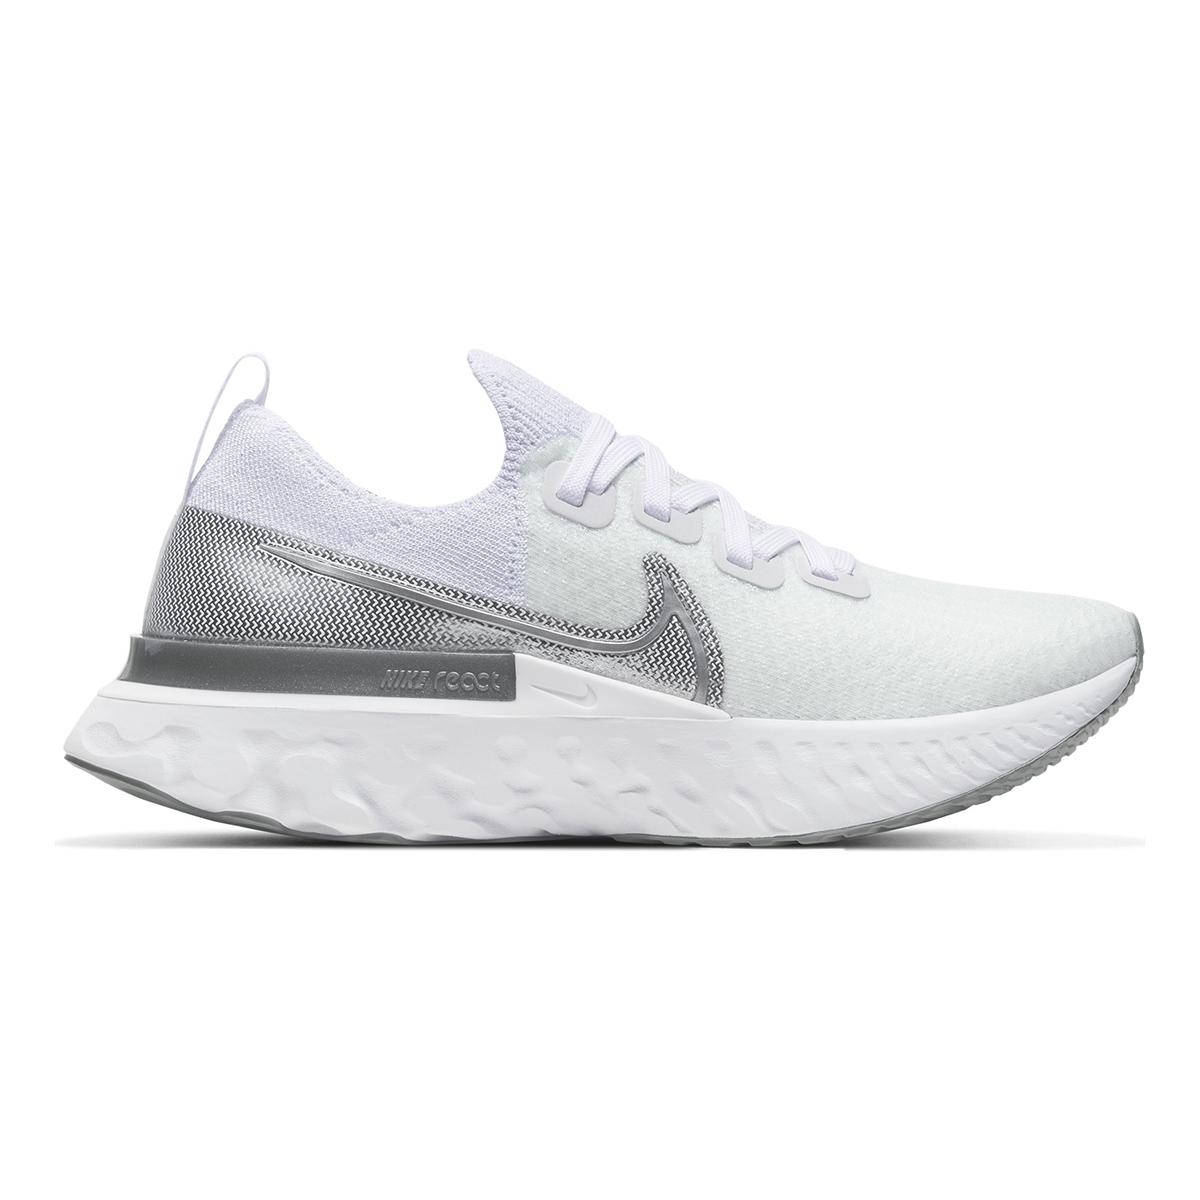 Women's Nike React Infinity Run Flyknit Running Shoe - Color: True White/White/Pure Platinum/Metallic Silver (Regular Width) - Size: 5, True White/White/Pure Platinum/Metallic Silver, large, image 1